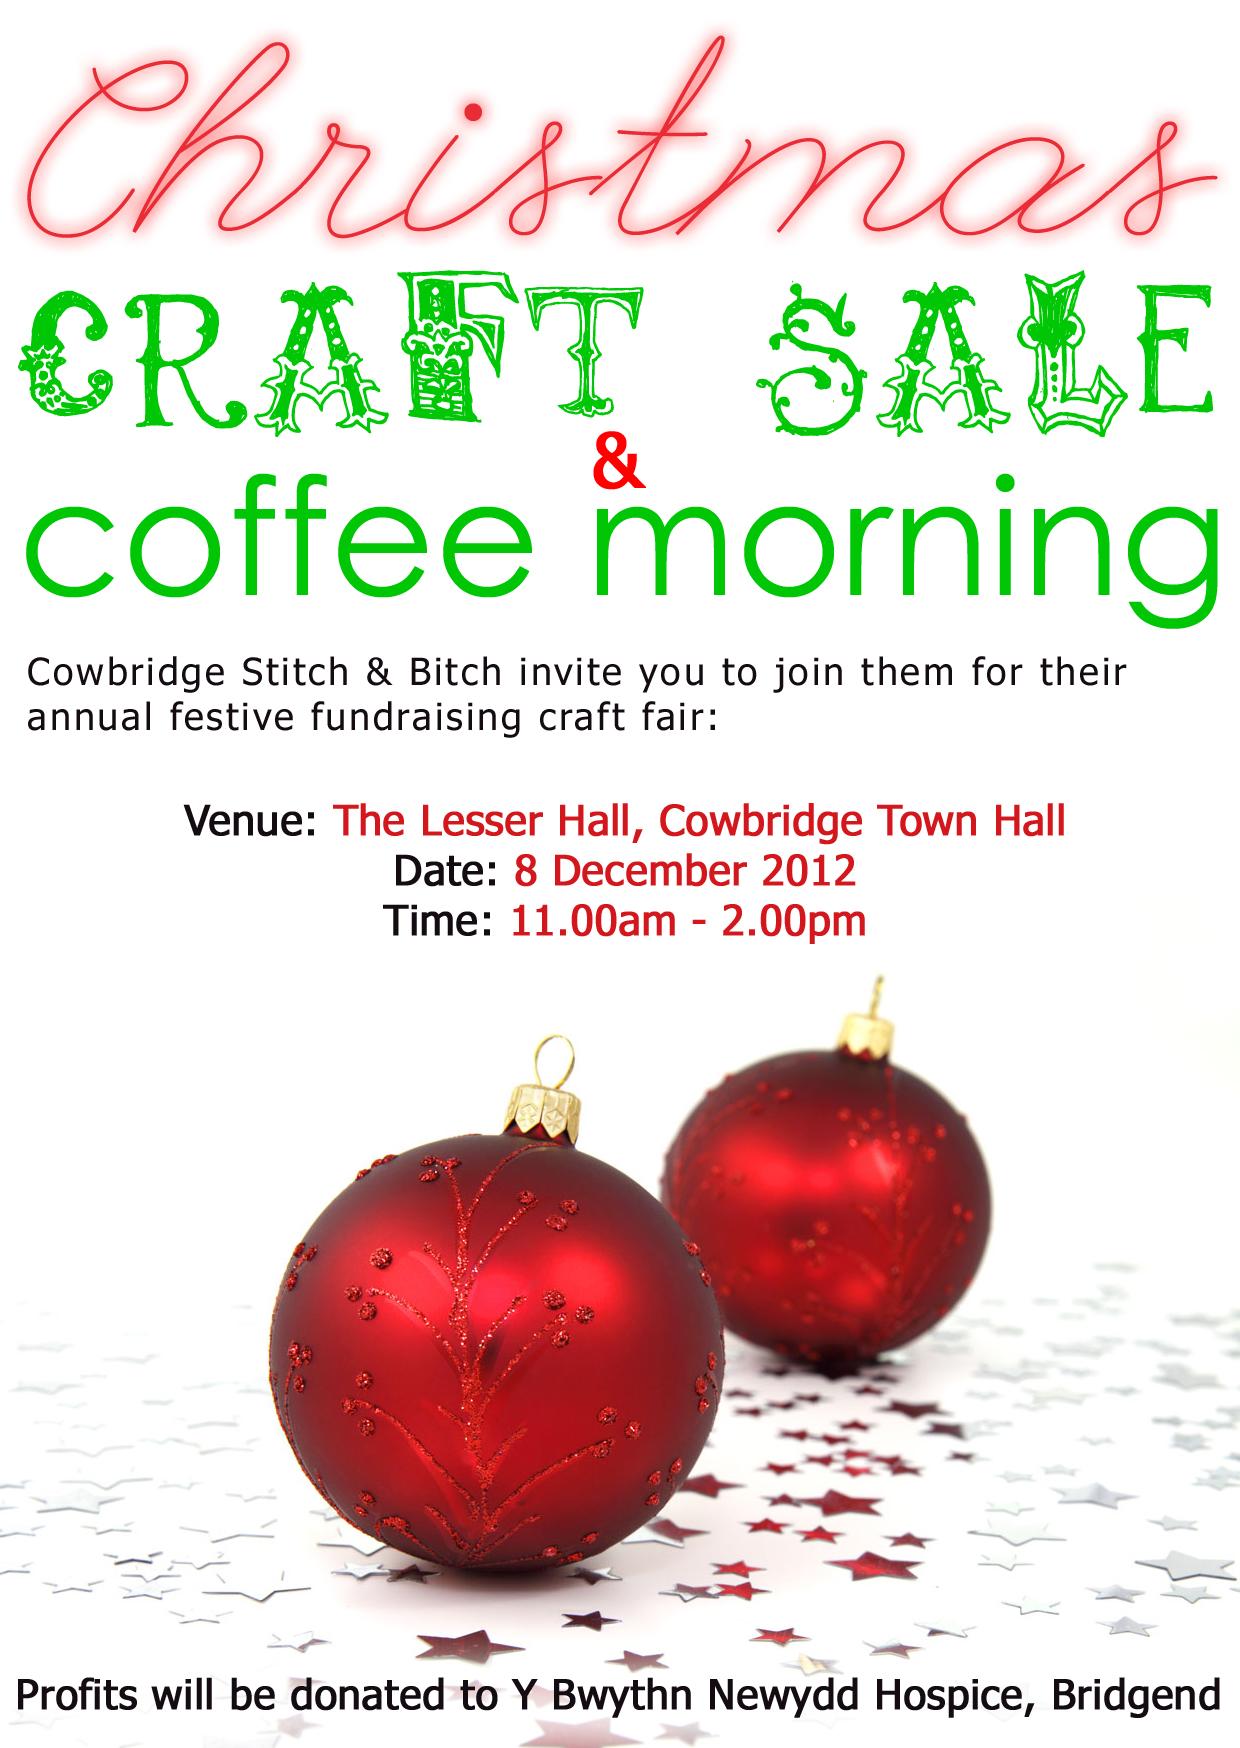 Cowbridge Christmas Craft Fair Spikeworld